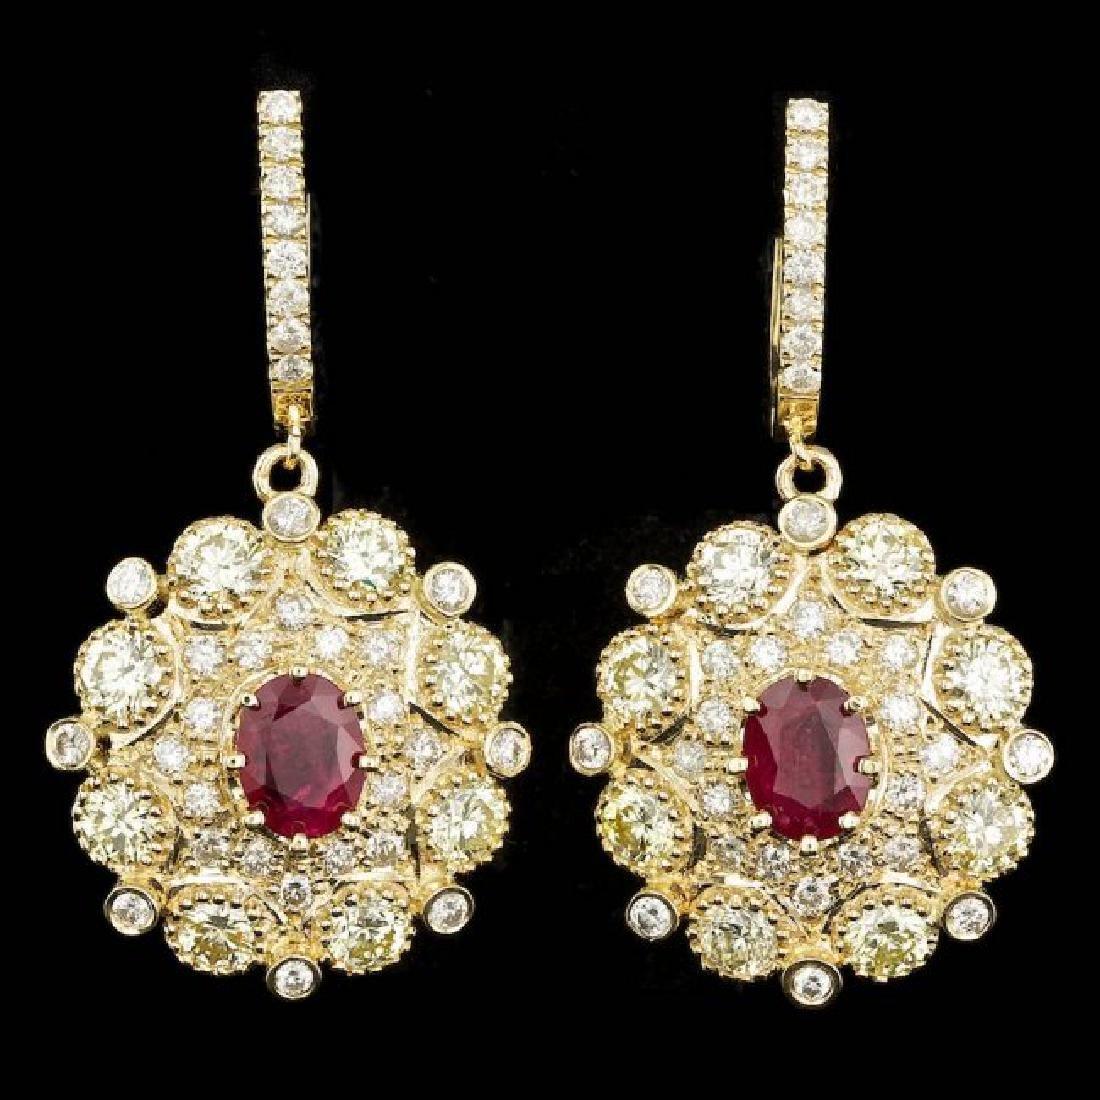 14k Yellow Gold 2.50ct Ruby 7ct Diamond Earrings